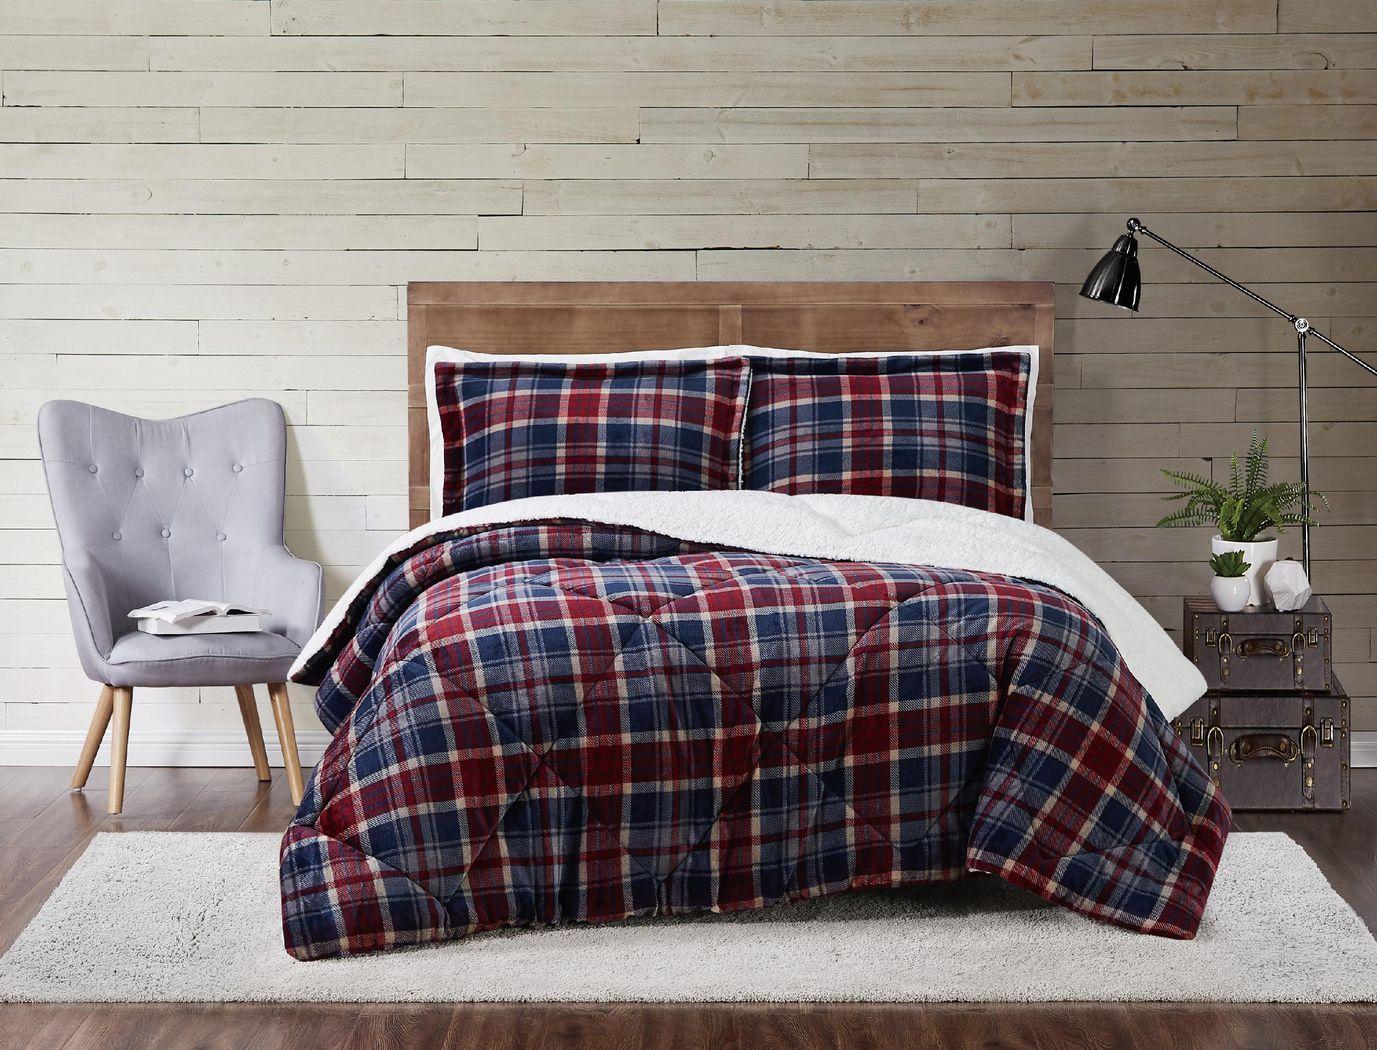 Kids Mossy Creek Blue 2 Pc Twin Comforter Set